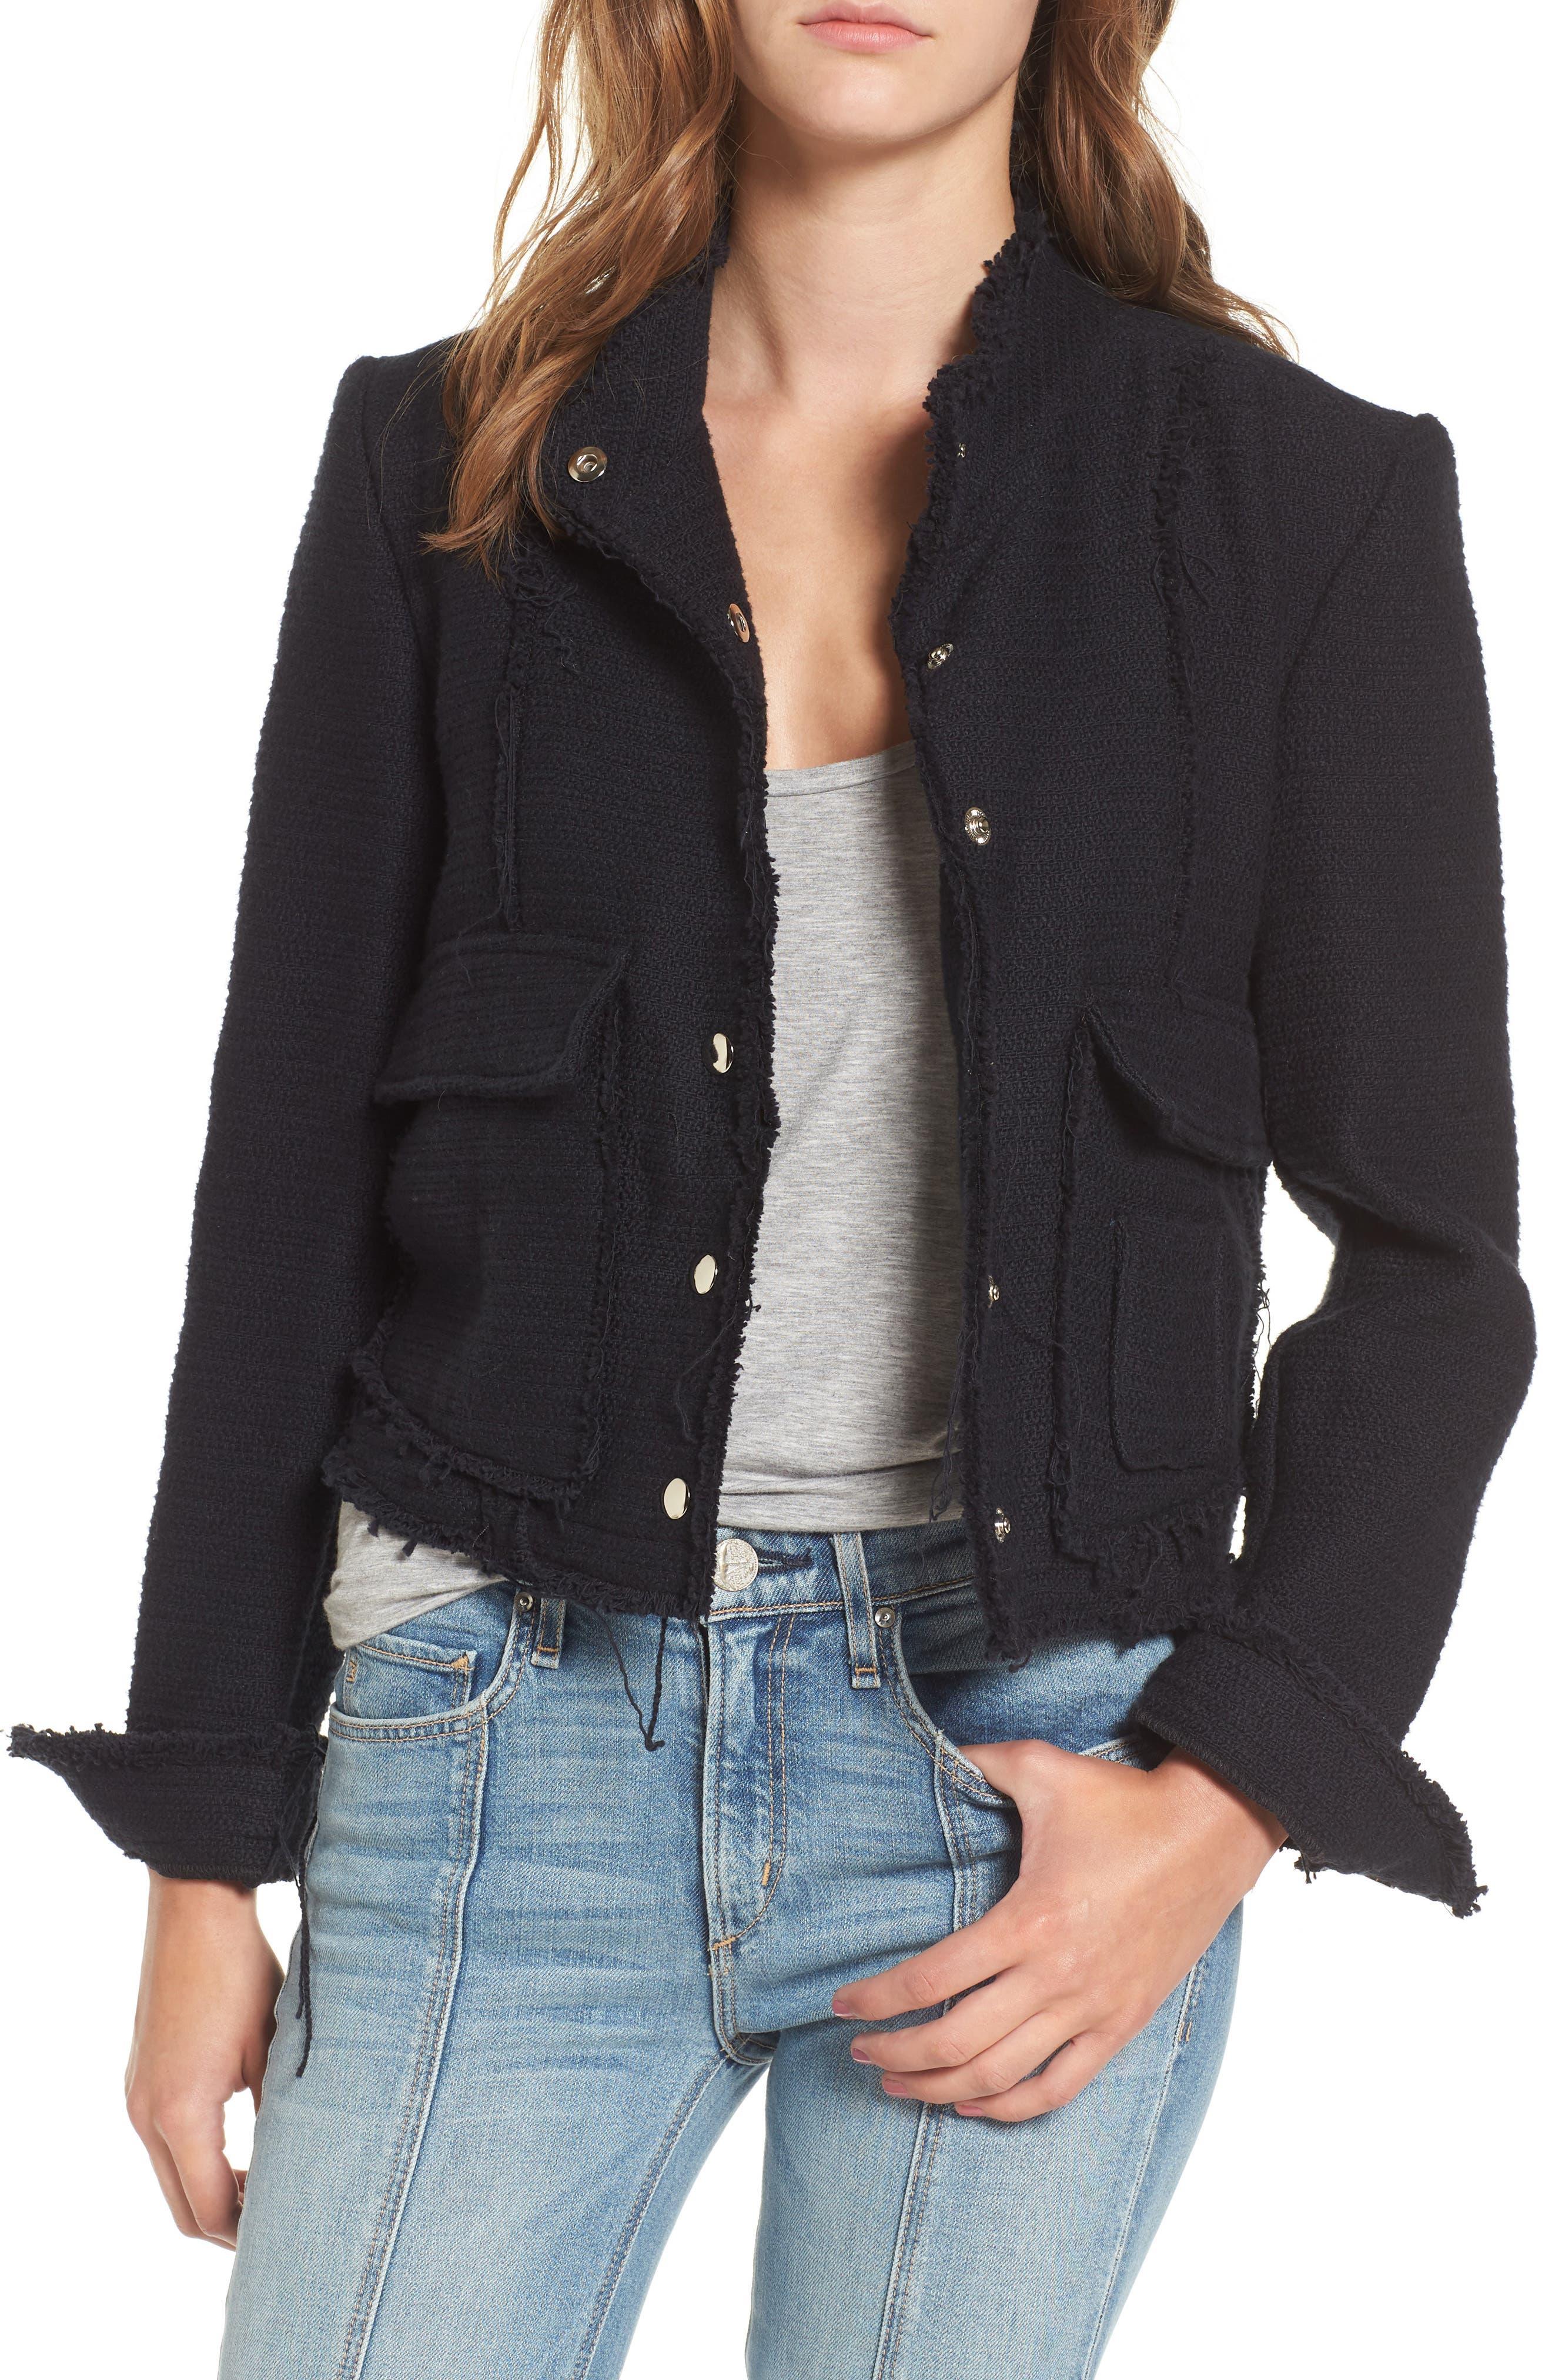 Alternate Image 1 Selected - McGuire Bloombury Crop Cotton Jacket